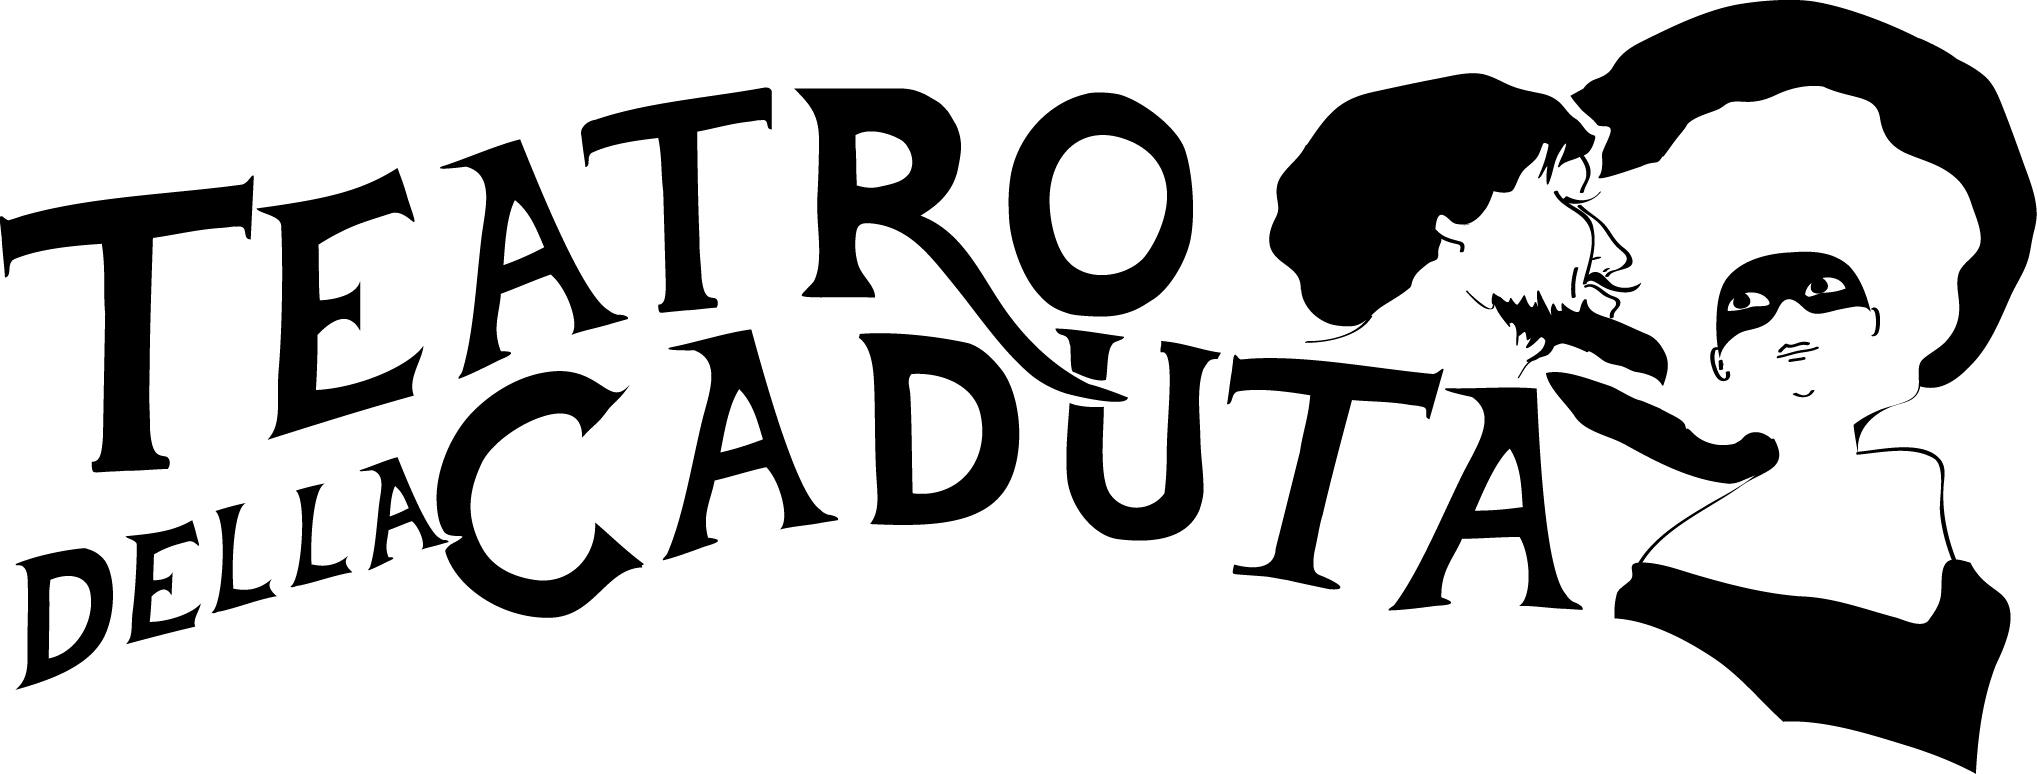 Logo Teatro della Caduta